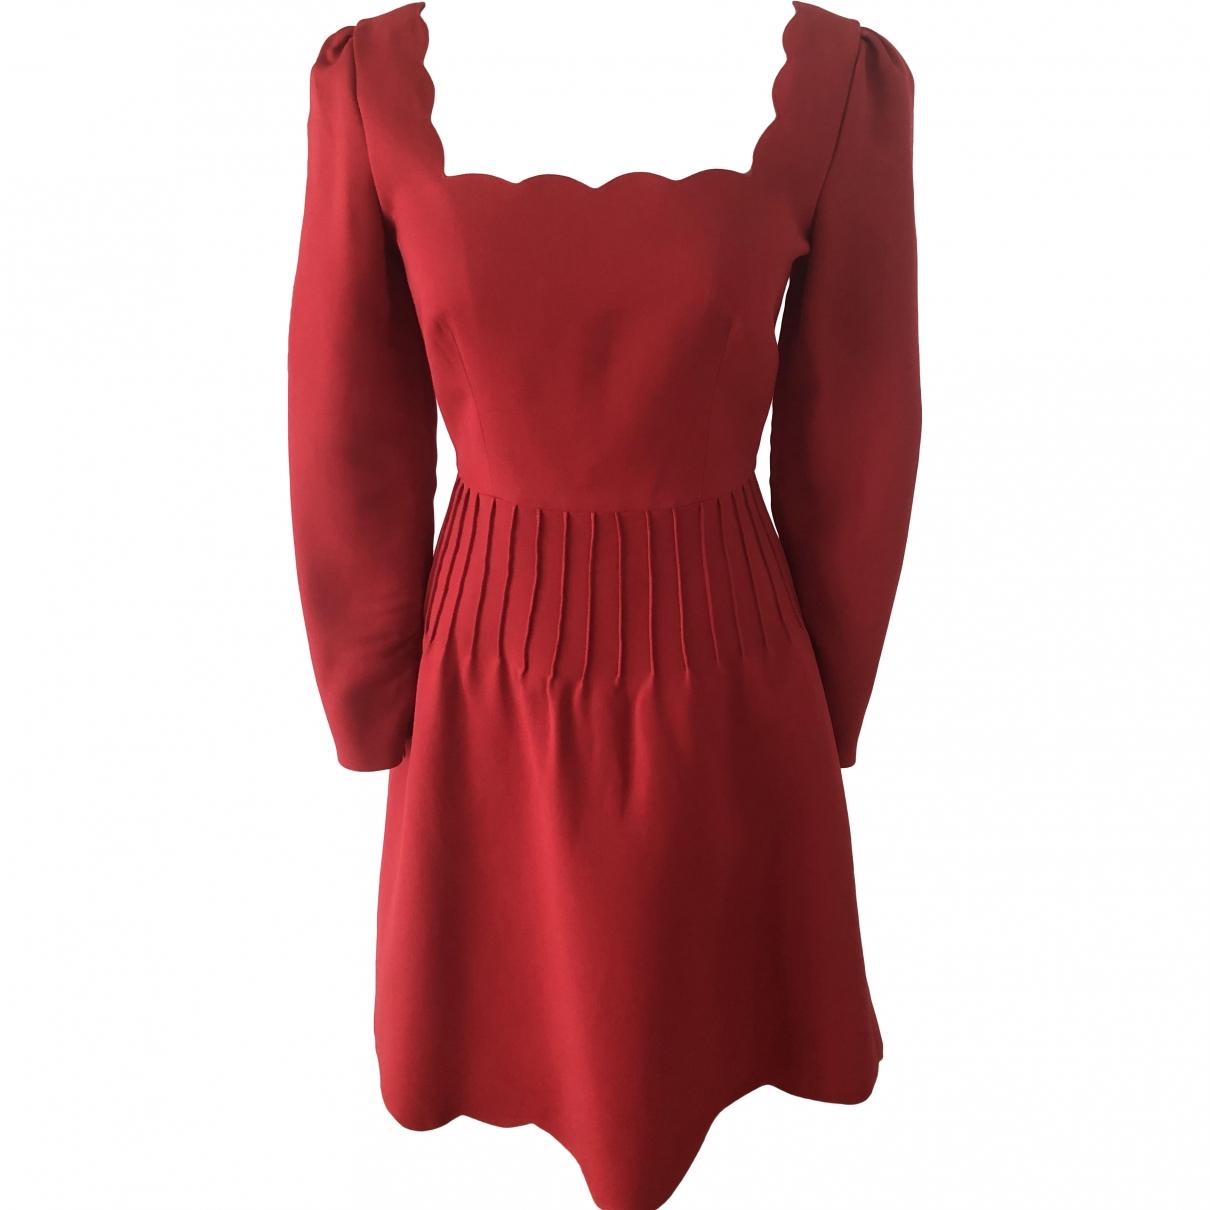 Valentino Garavani \N Red Wool dress for Women 44 IT